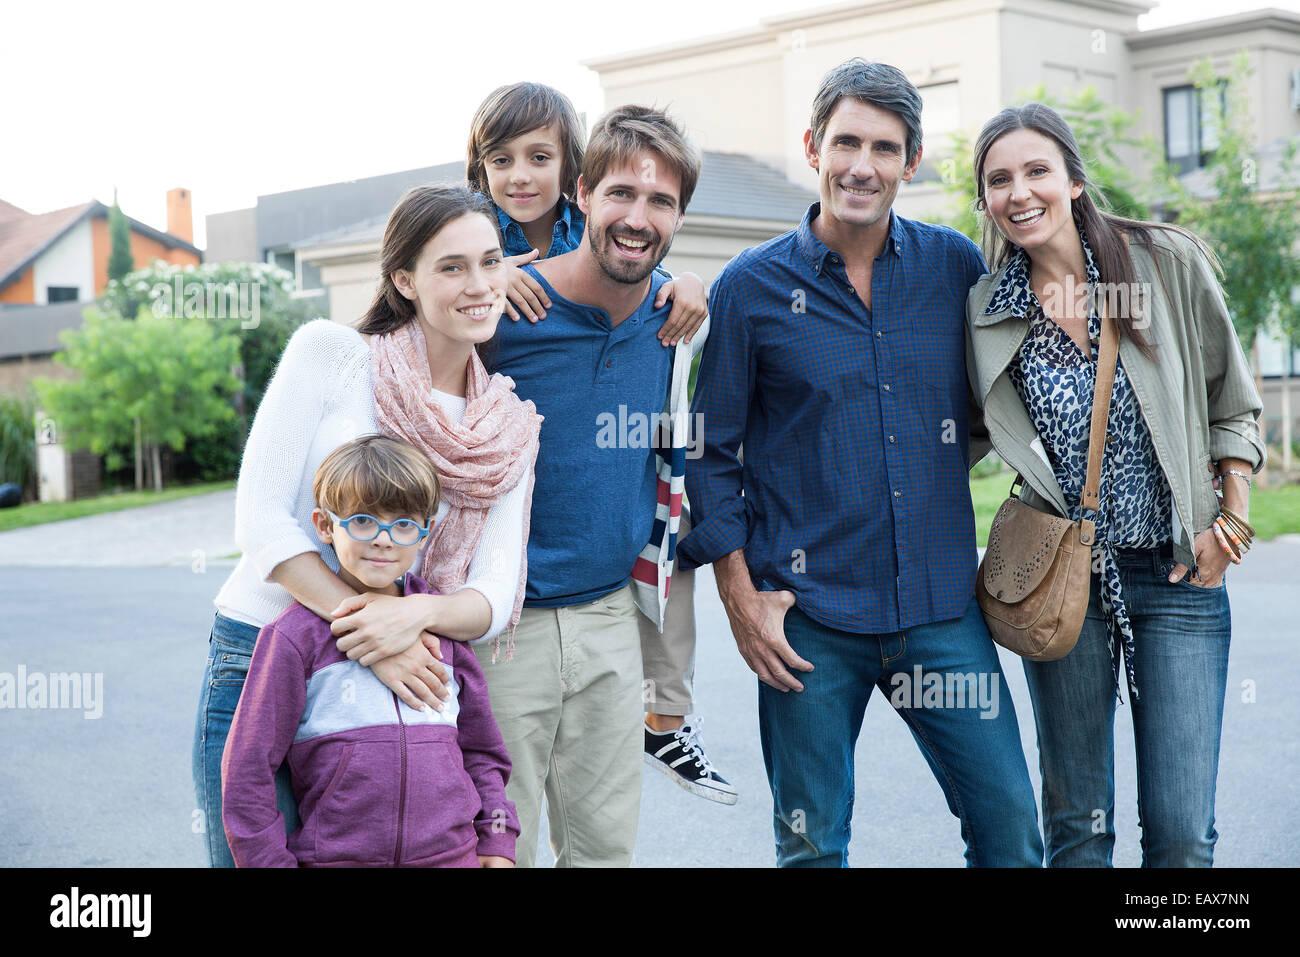 Family posing together on suburban street, portrait - Stock Image